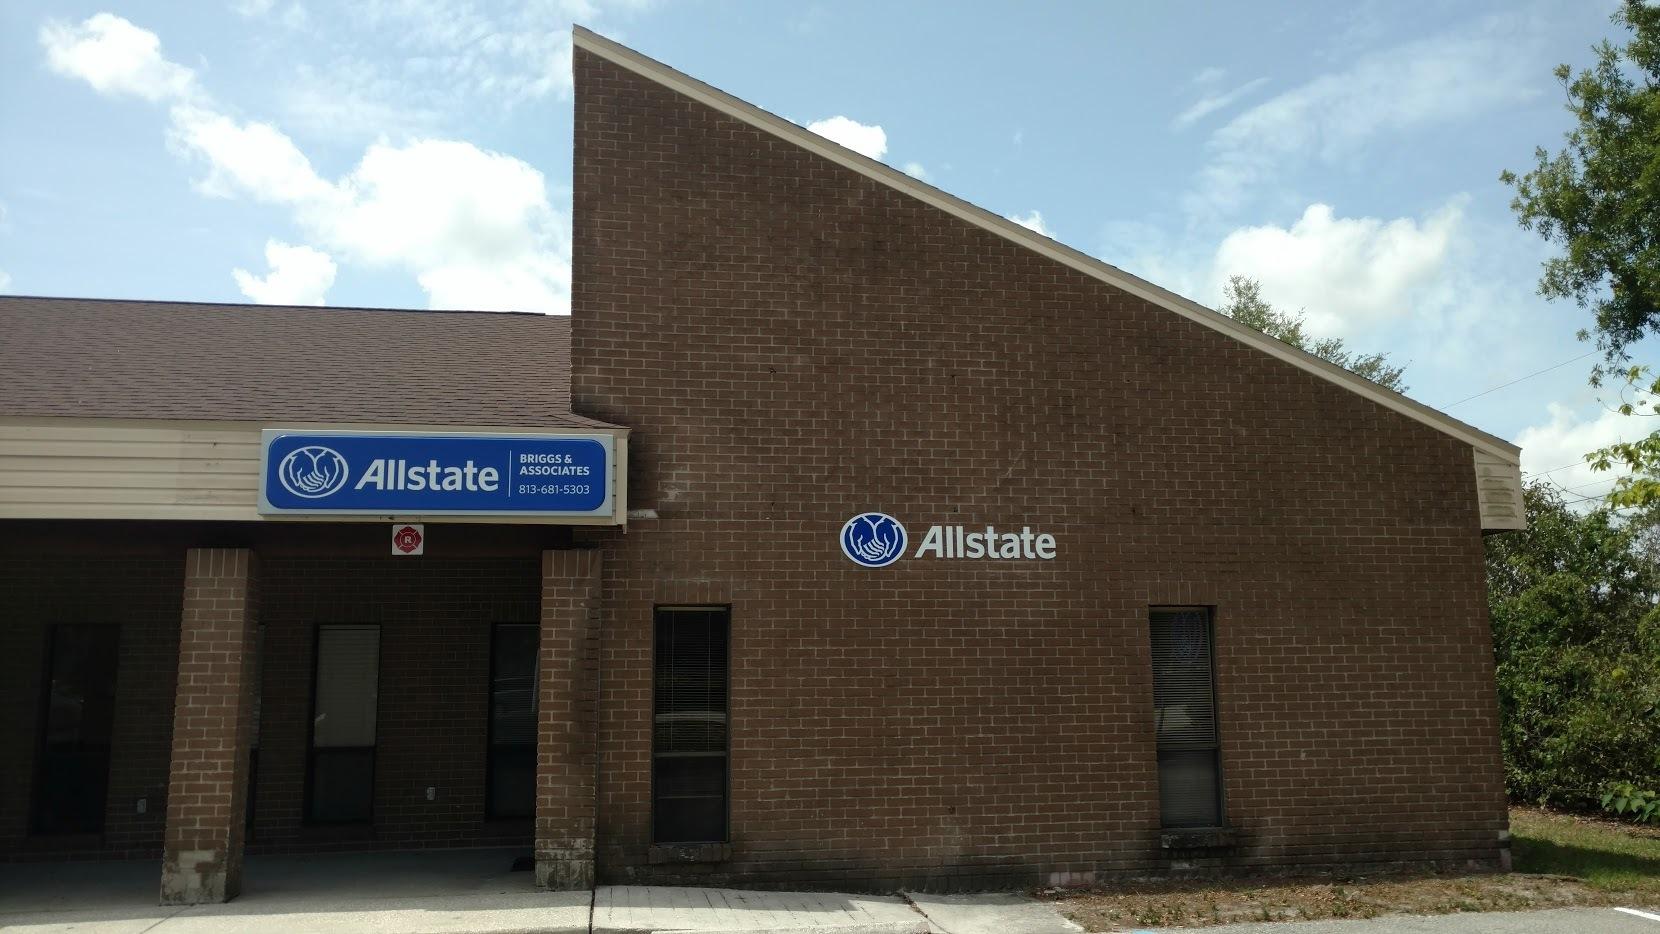 Allstate | Car Insurance in Brandon, FL - Stephen Briggs